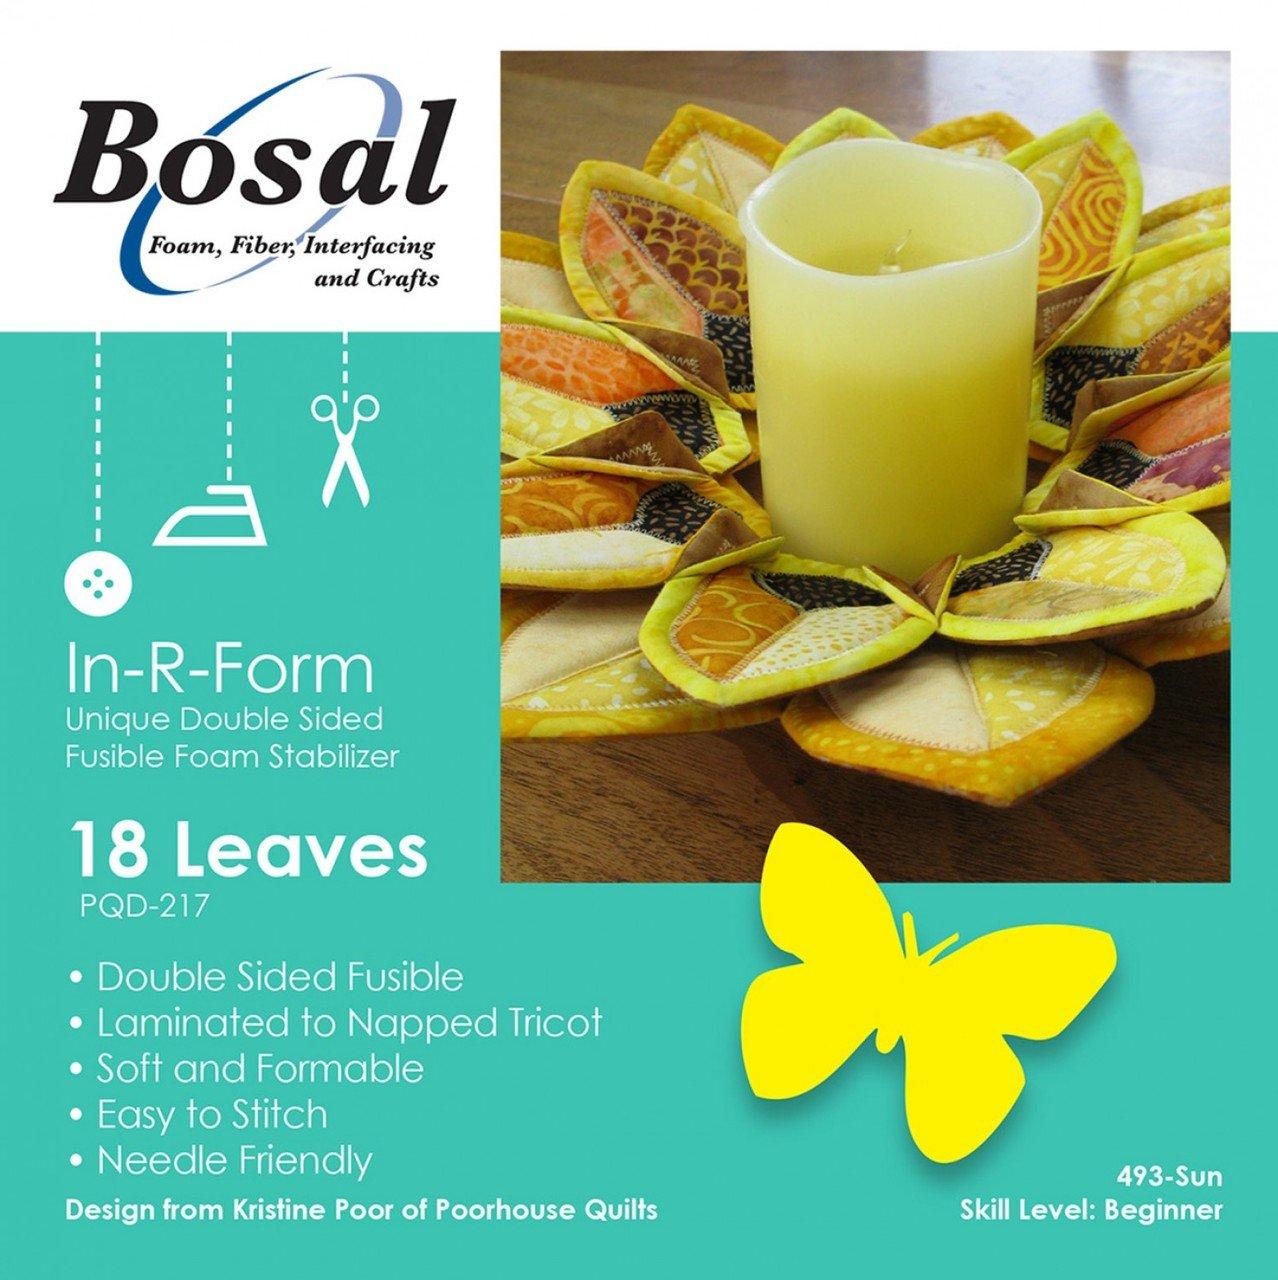 Bosal Sunflower Petals Wreath Kit 493B-SUN